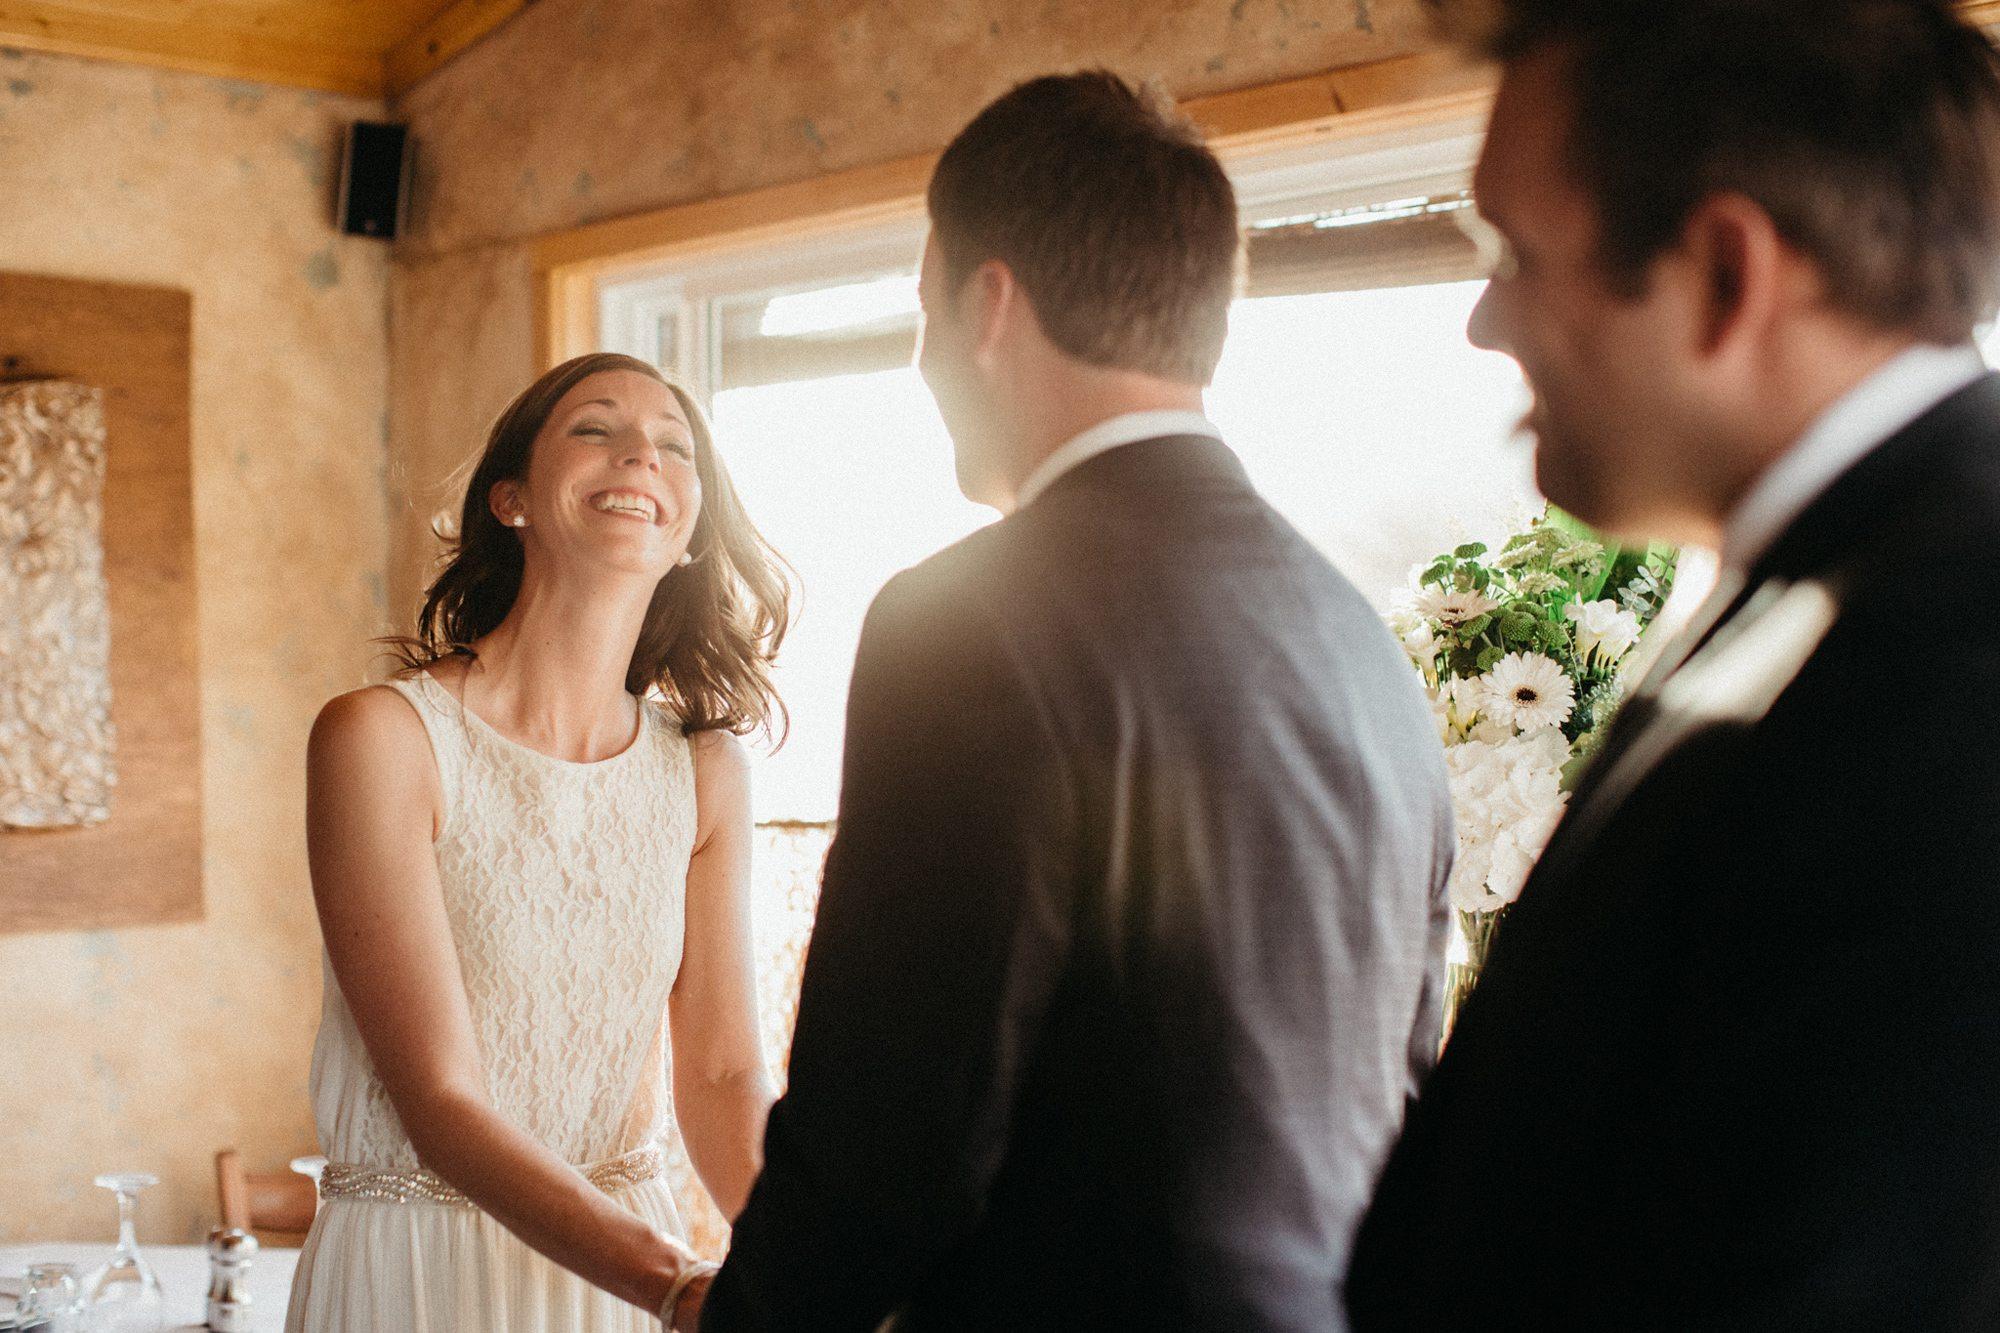 912-vancouver-elopement-photographer